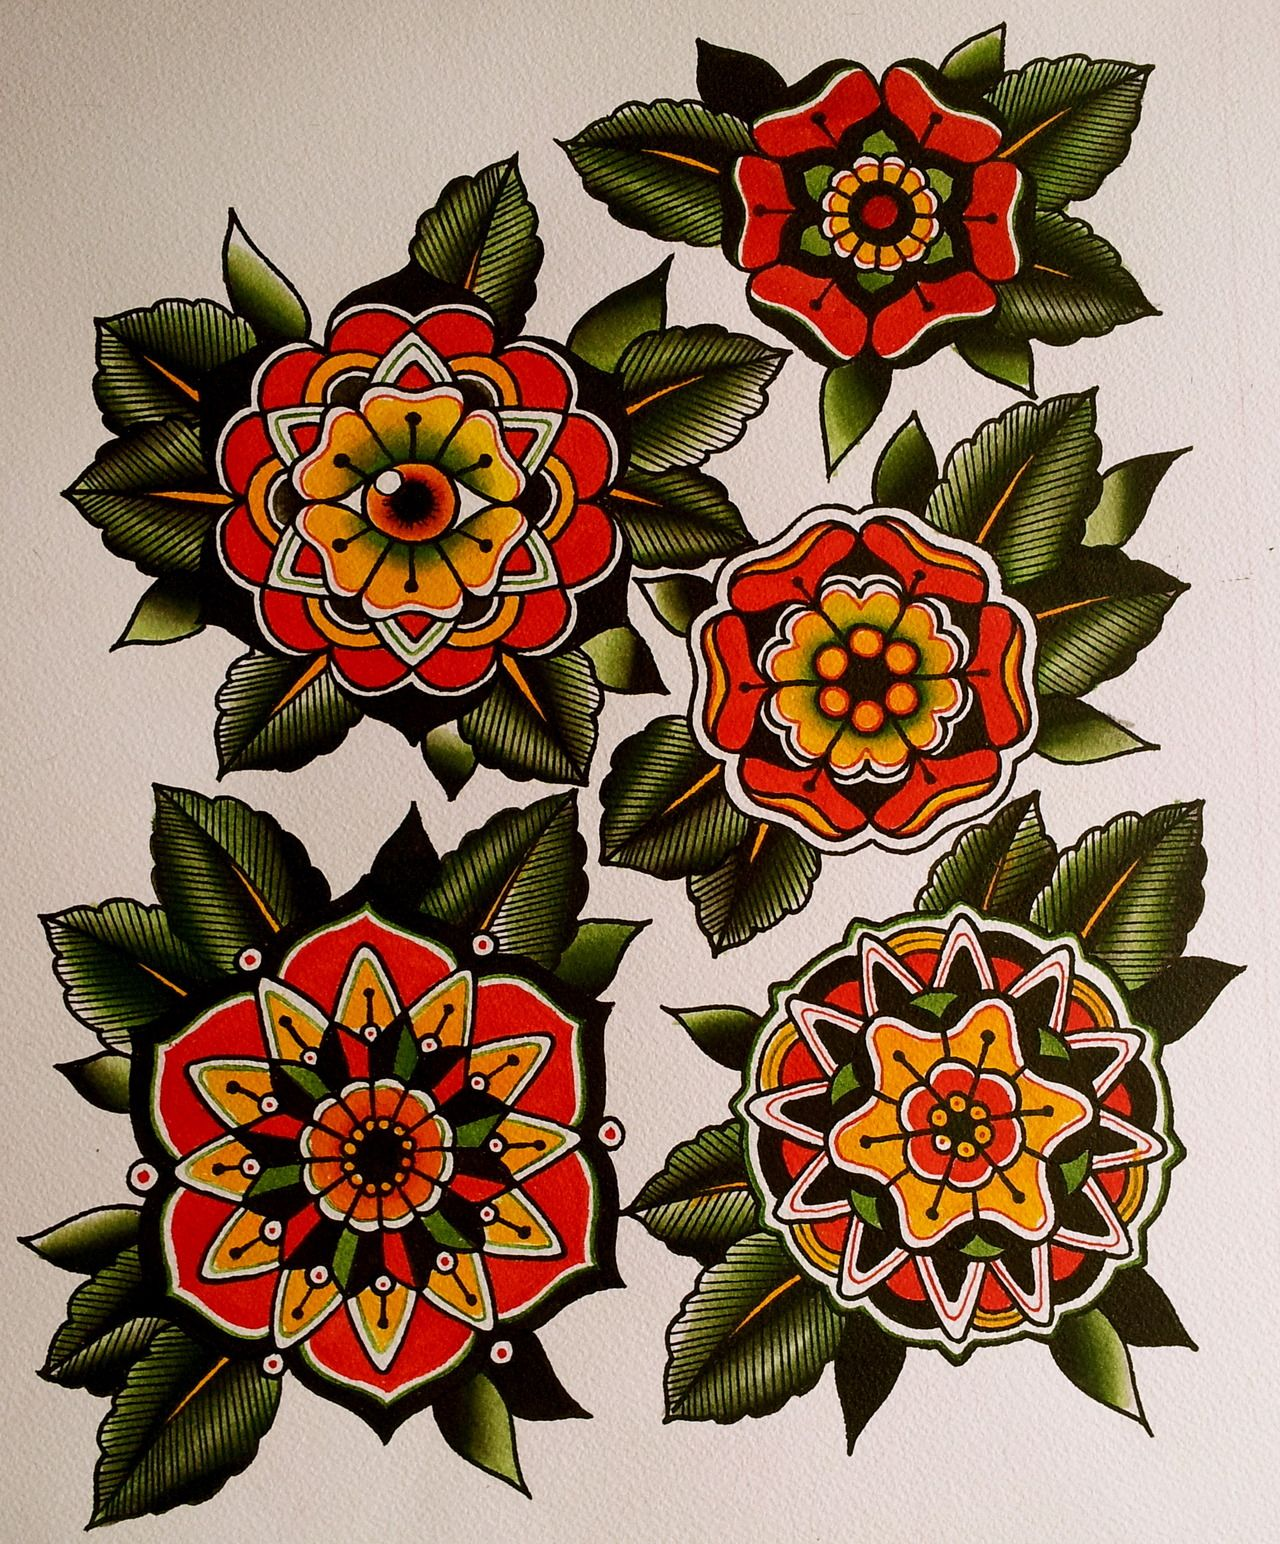 traditionalrawb: mandala sheet I painted last night. | Tatts ...